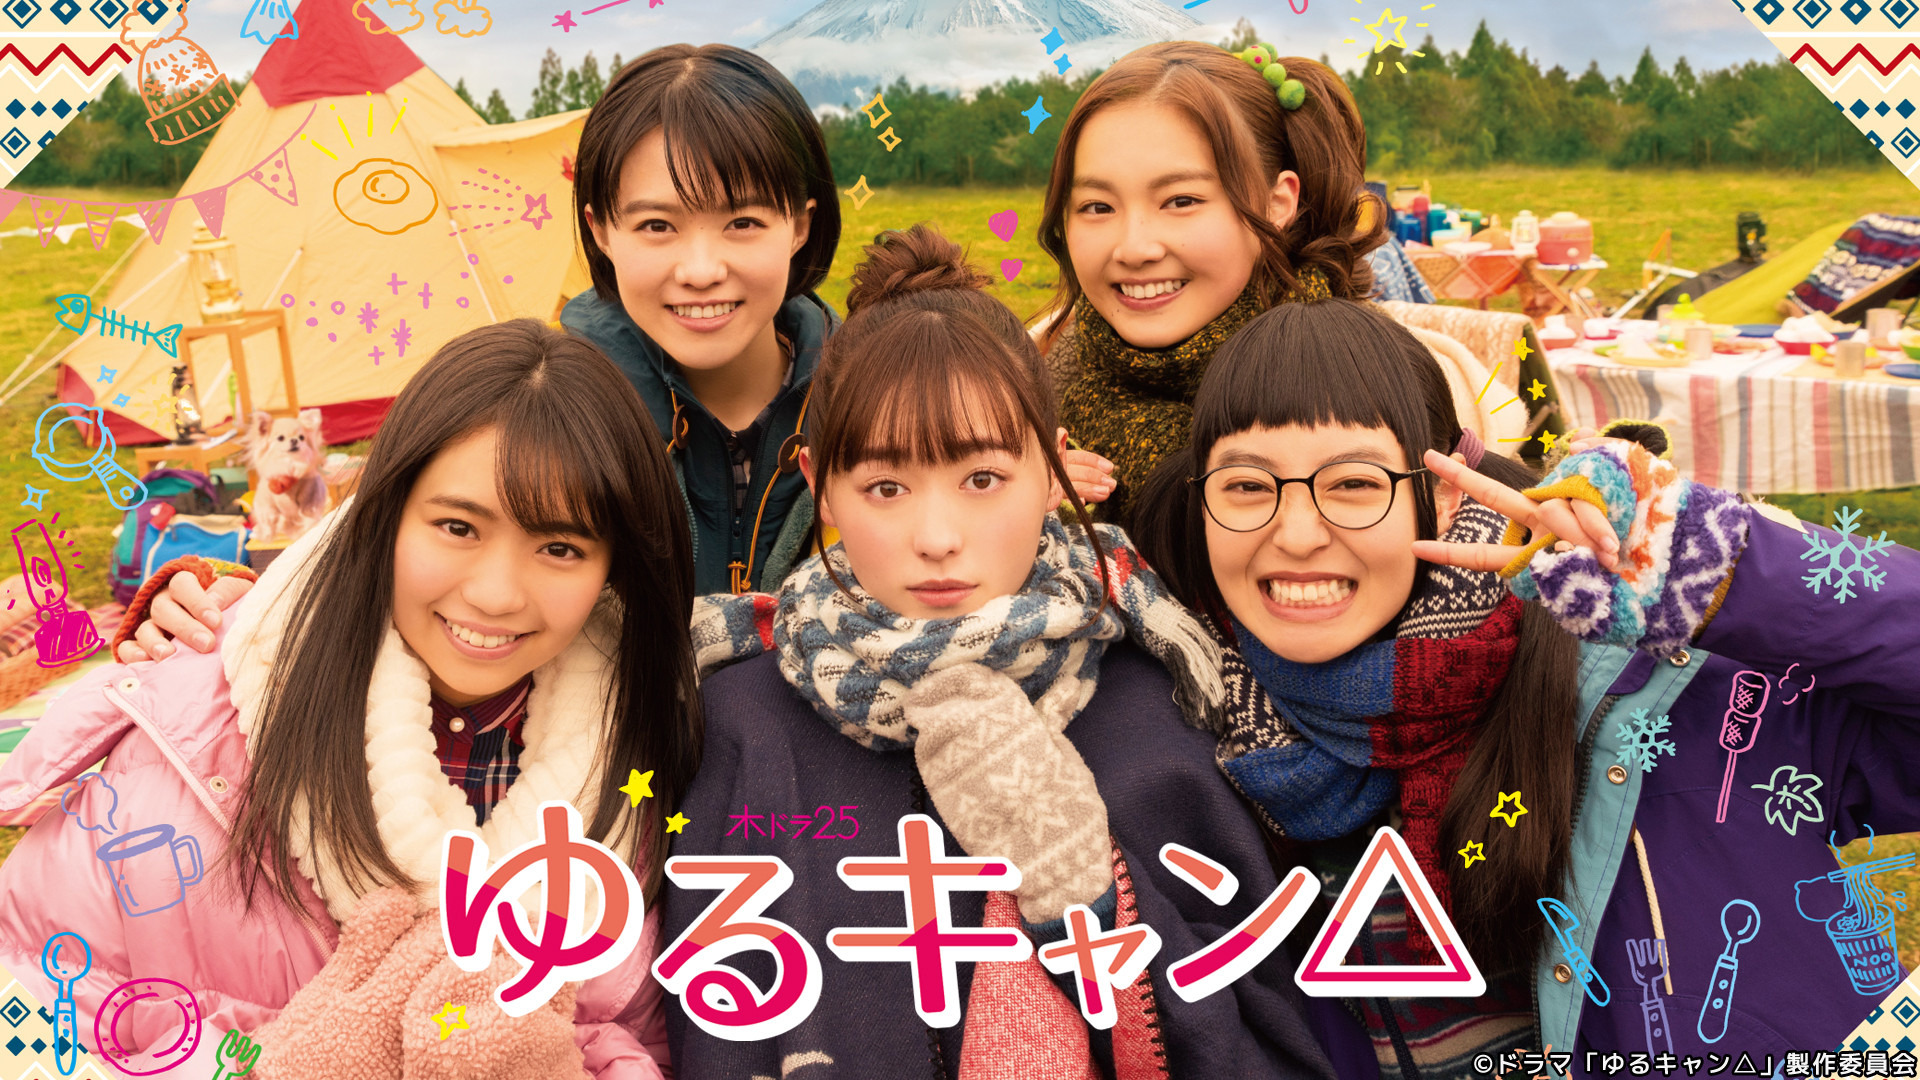 Show Yuru Camp